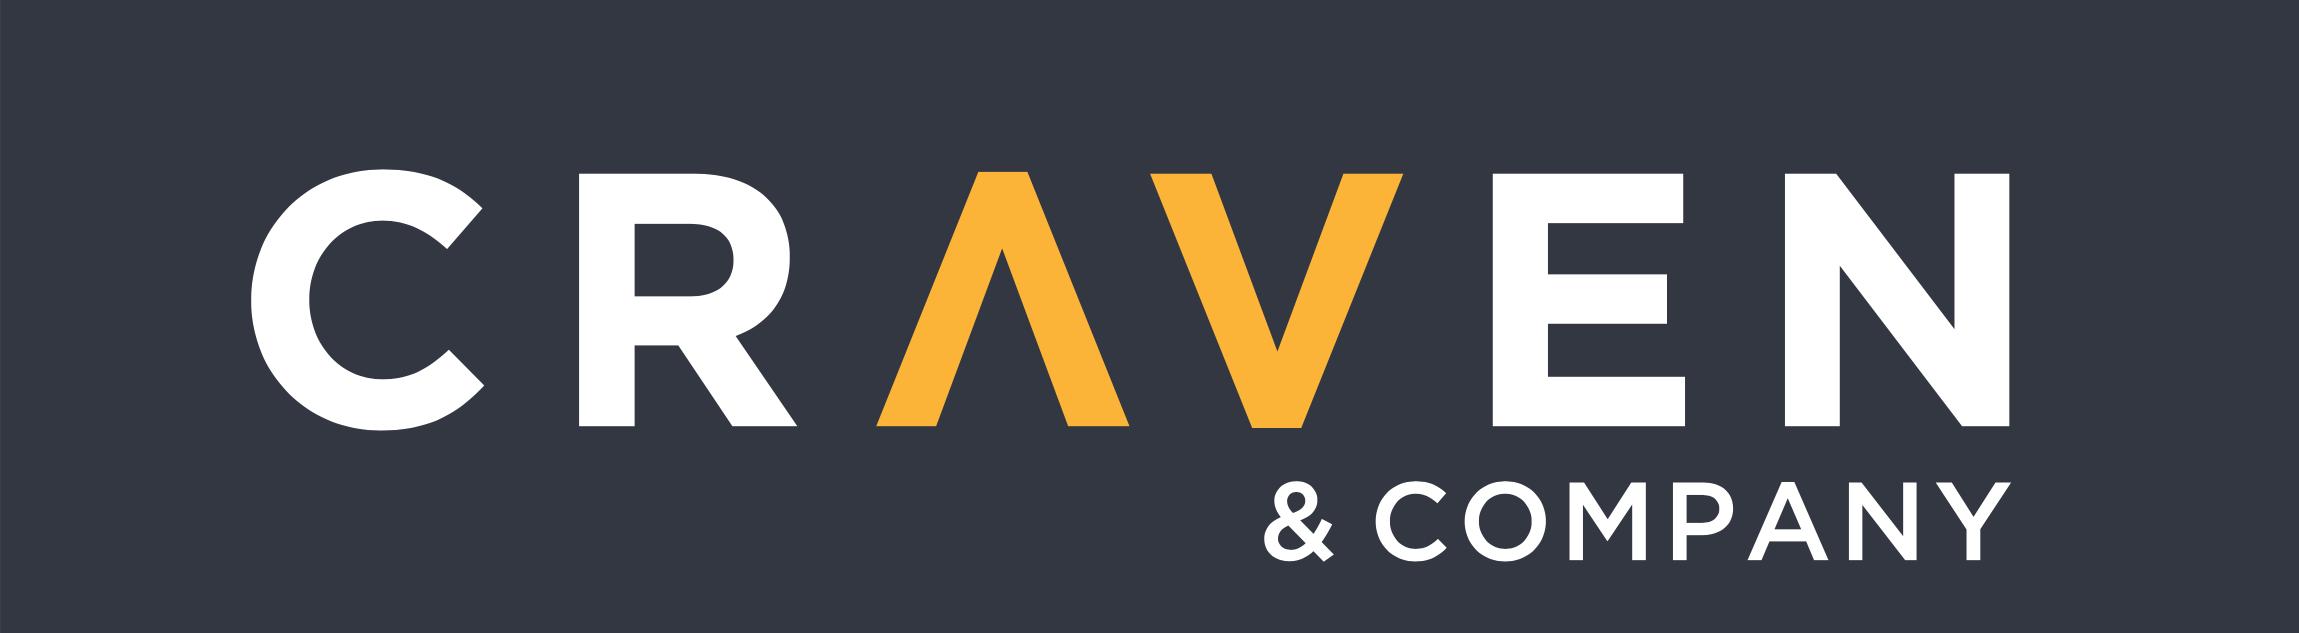 Craven & Company